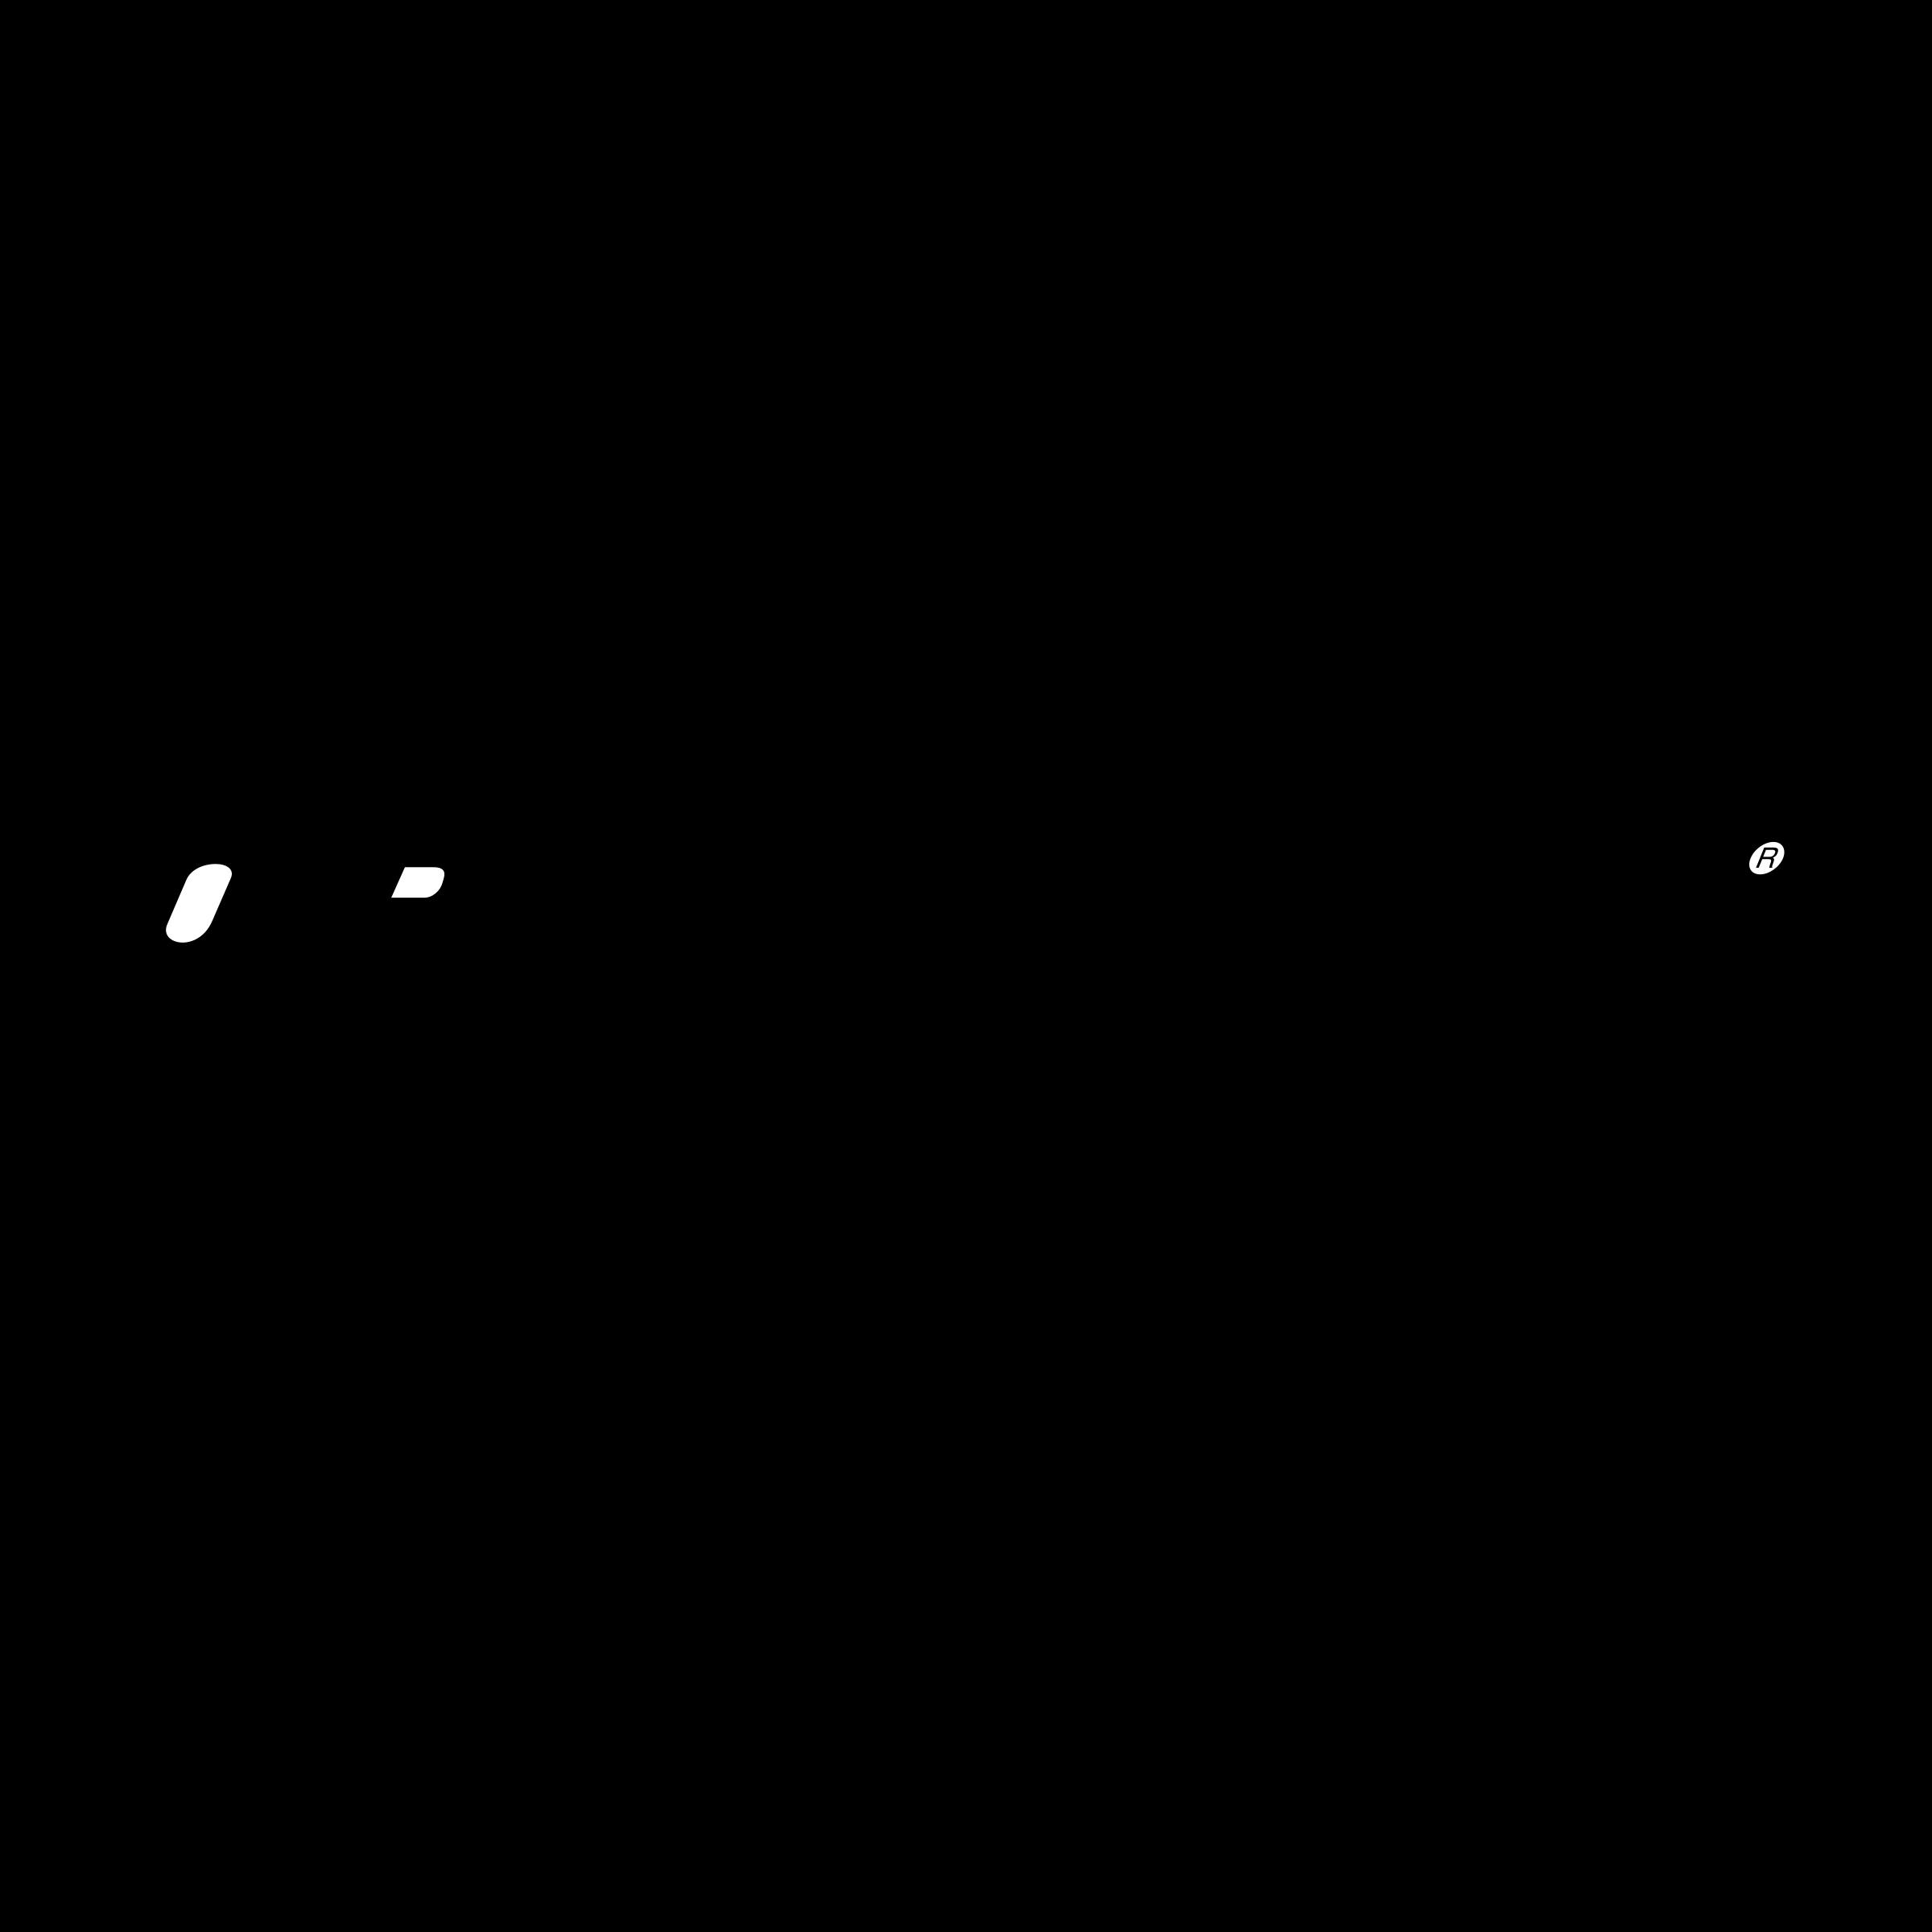 Oreck XL Logo PNG Transparent & SVG Vector.